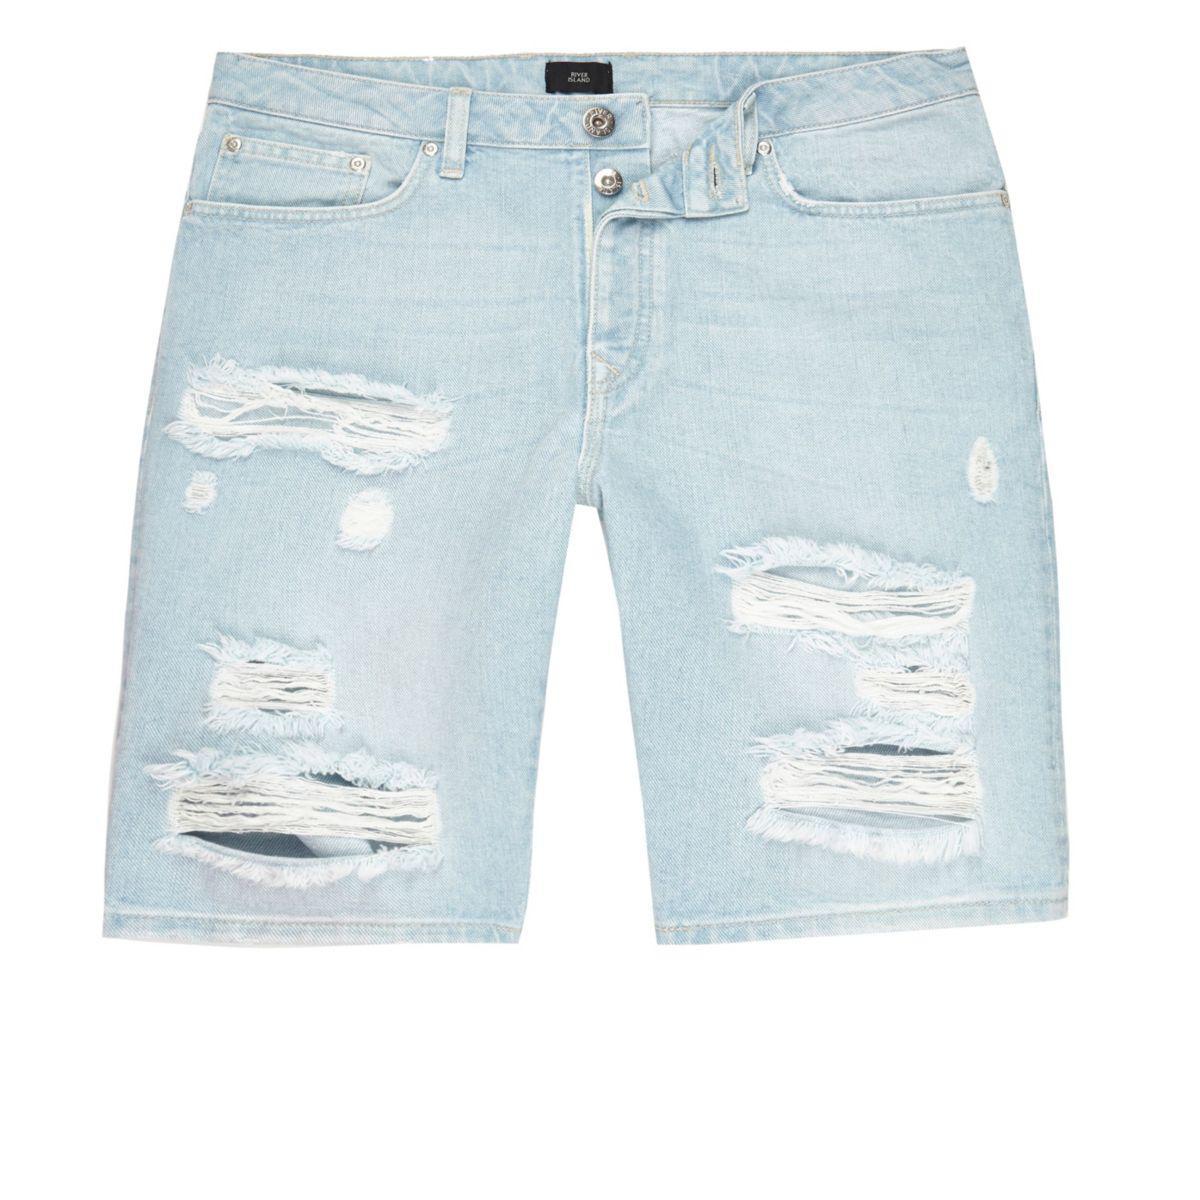 7e043734f8c14 Lyst - River Island Light Blue Wash Ripped Slim Fit Denim Shorts in ...